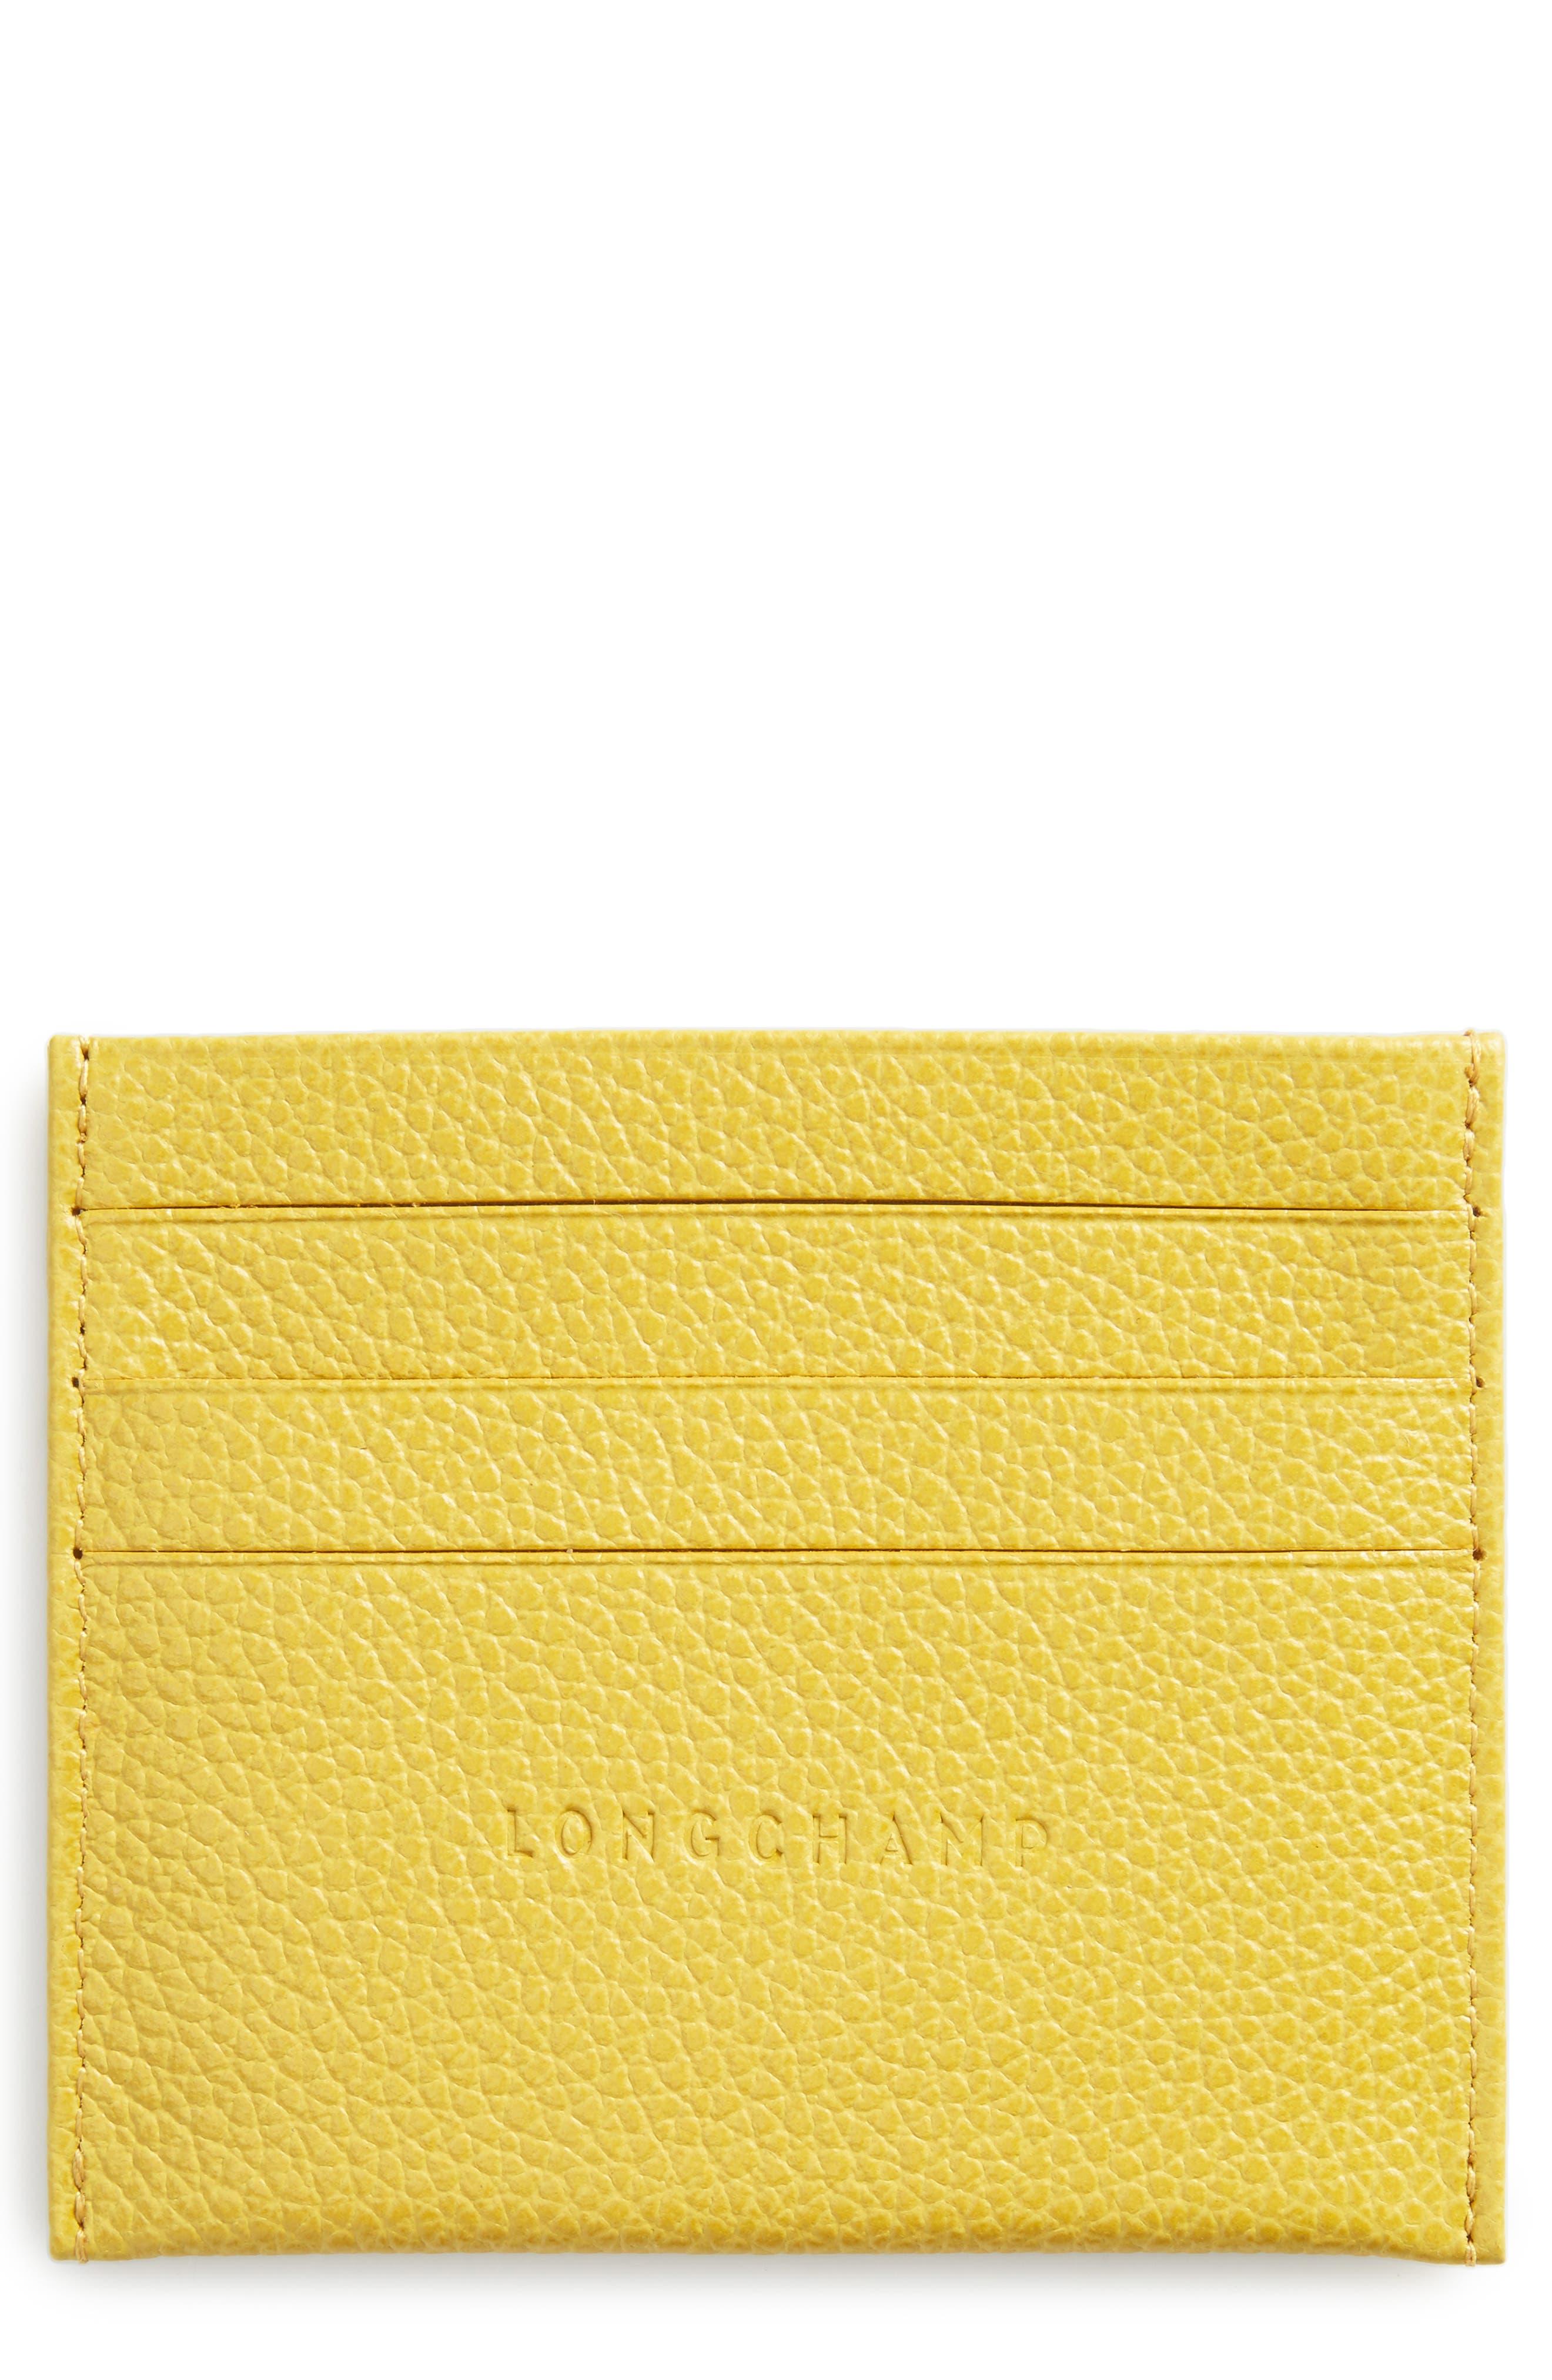 Alternate Image 1 Selected - Longchamp 'Le Foulonne' Pebbled Leather Card Holder